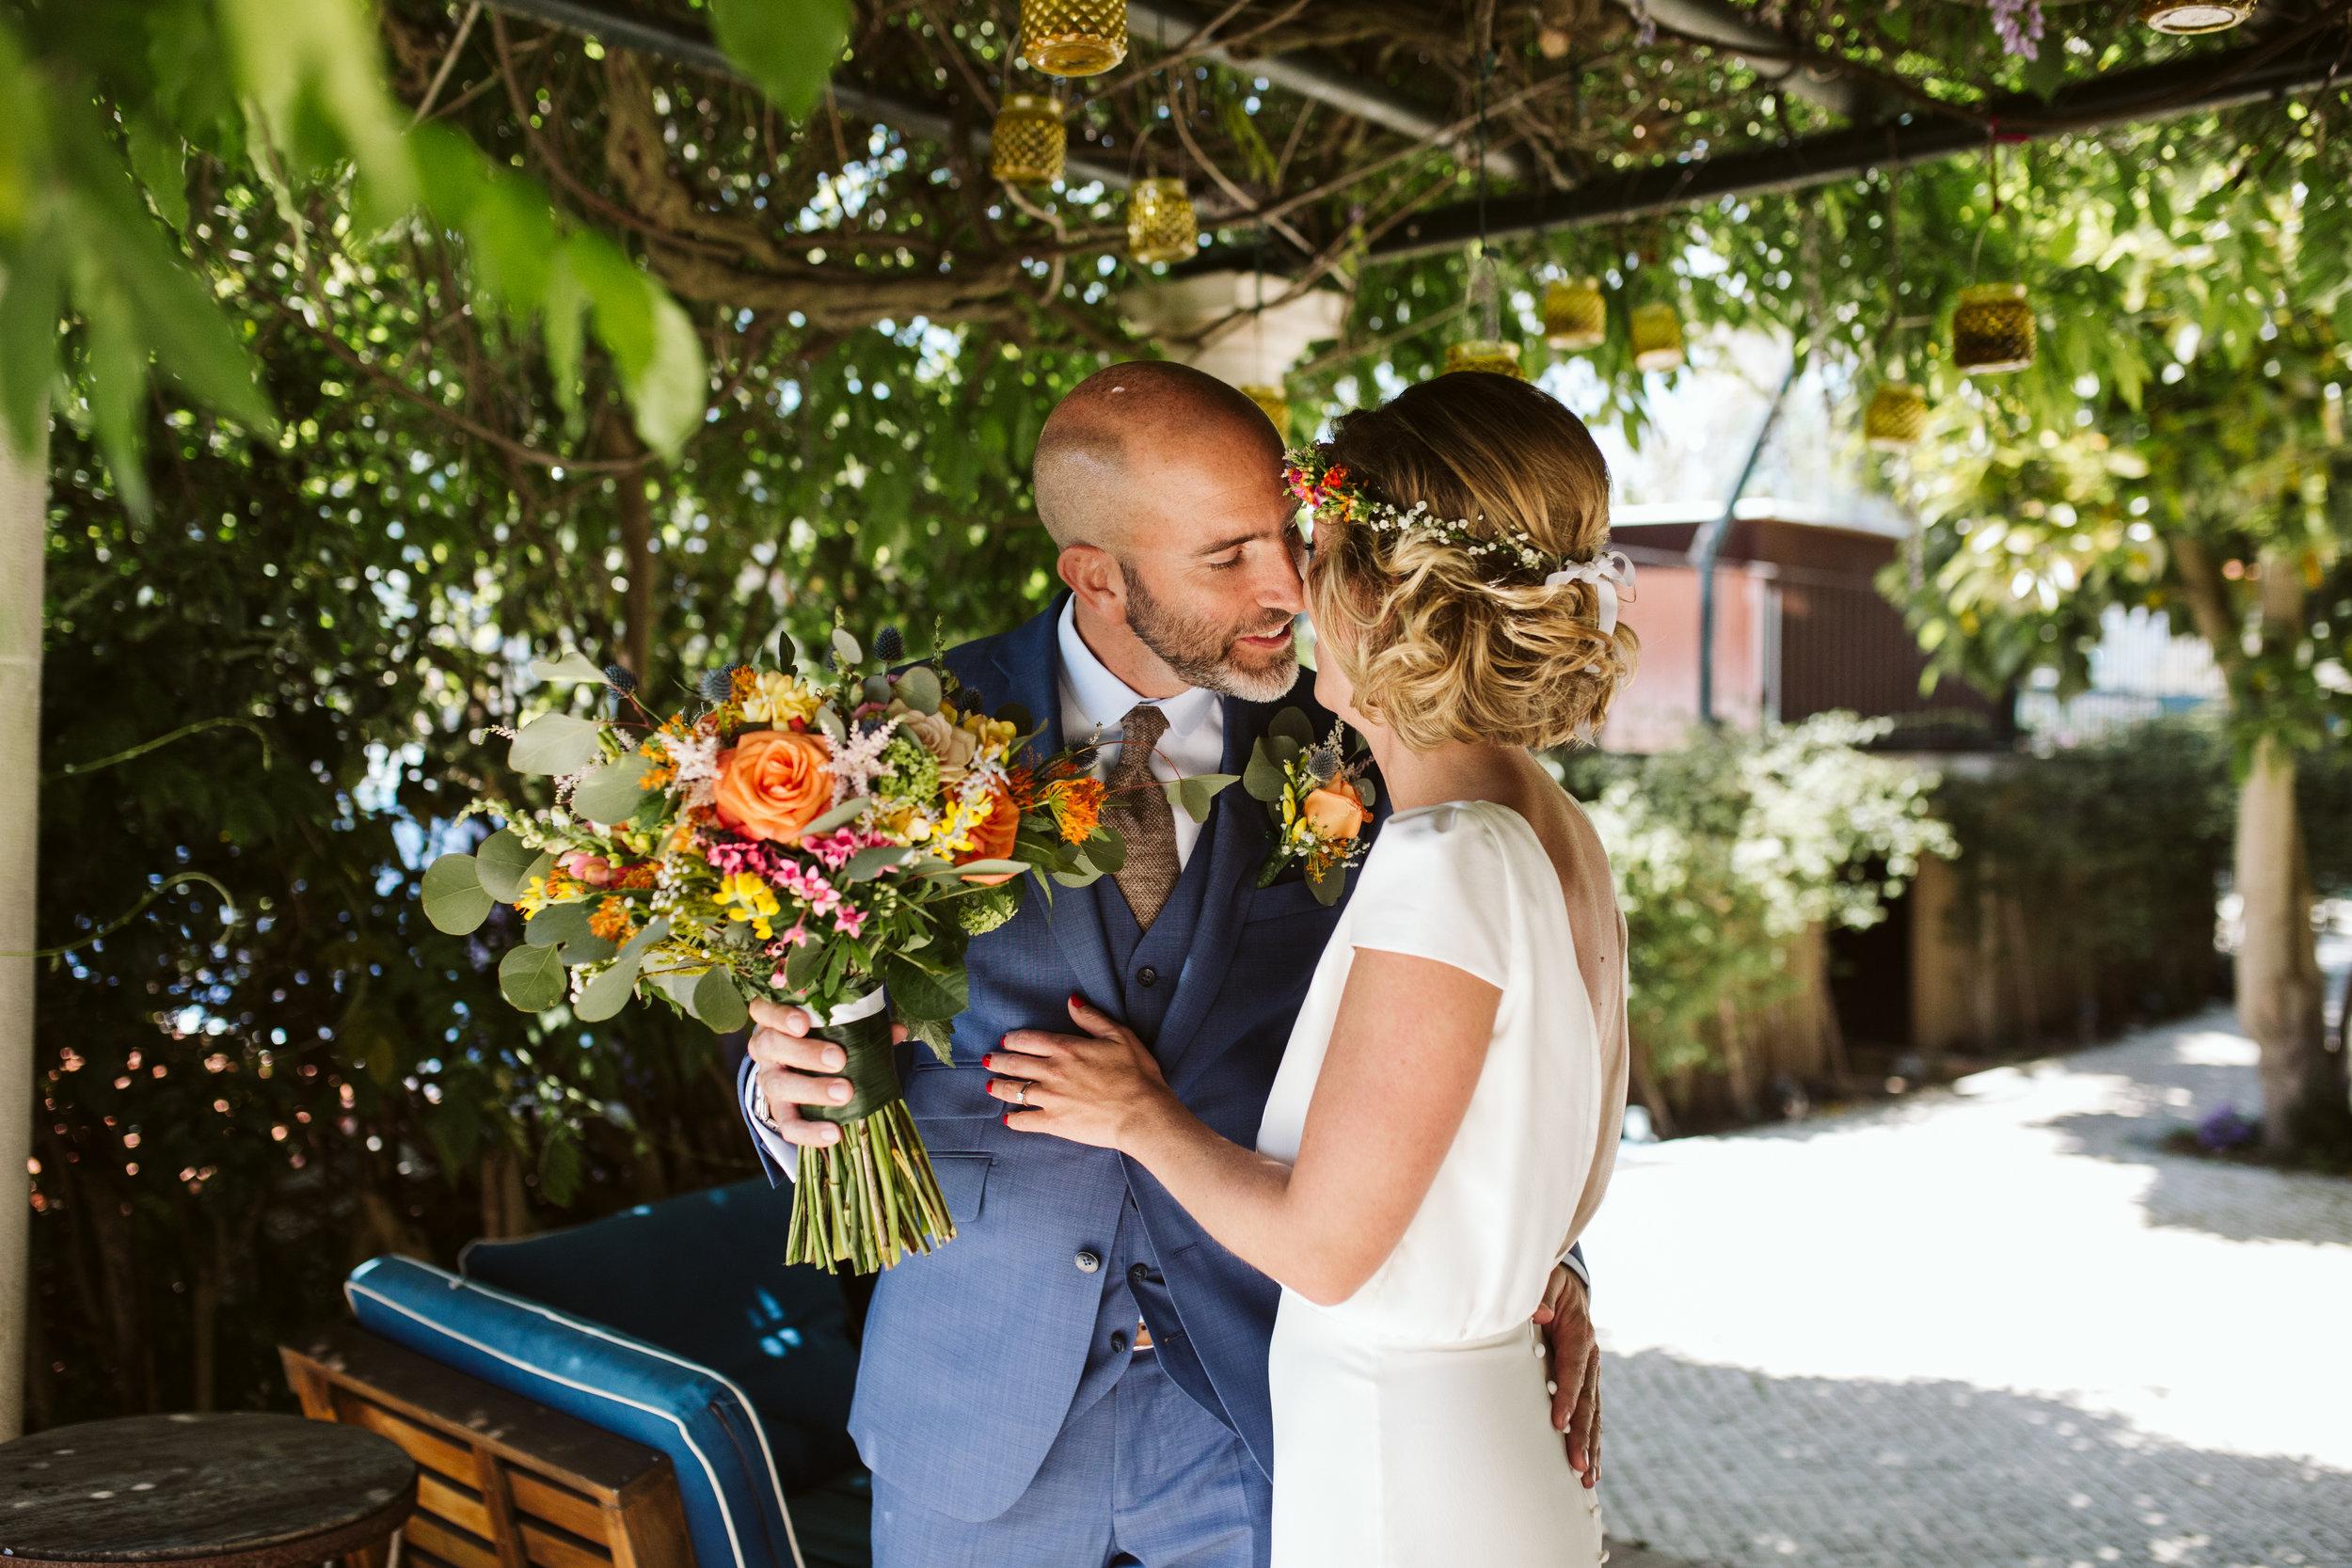 A&J _156_ 11_maio_2018_wedding_day.jpg